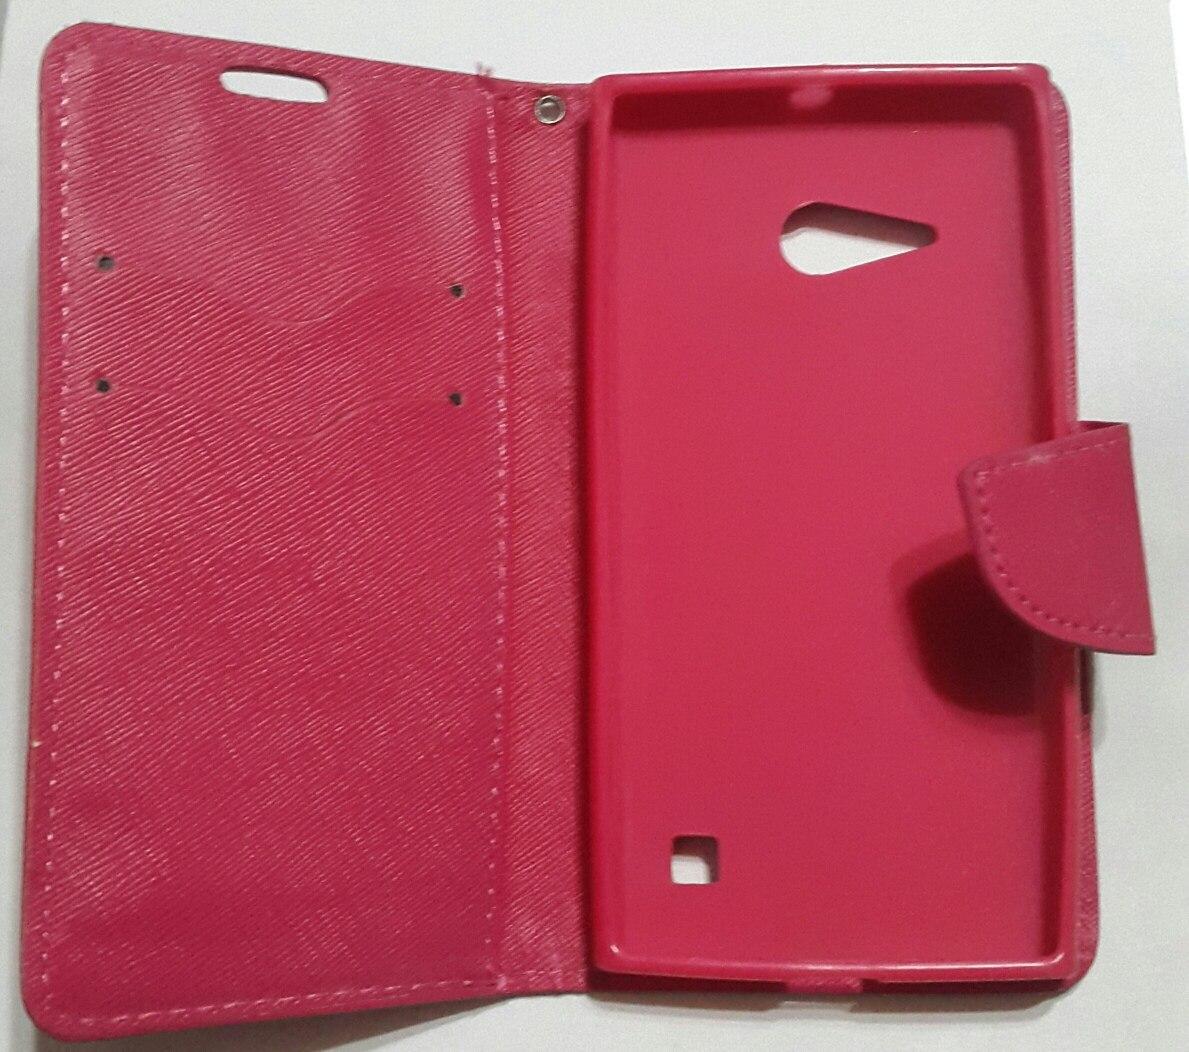 8cc631625e4 Funda Protector Flip Cover Lumia 640 435 Billetera Nokia - $ 190,00 ...